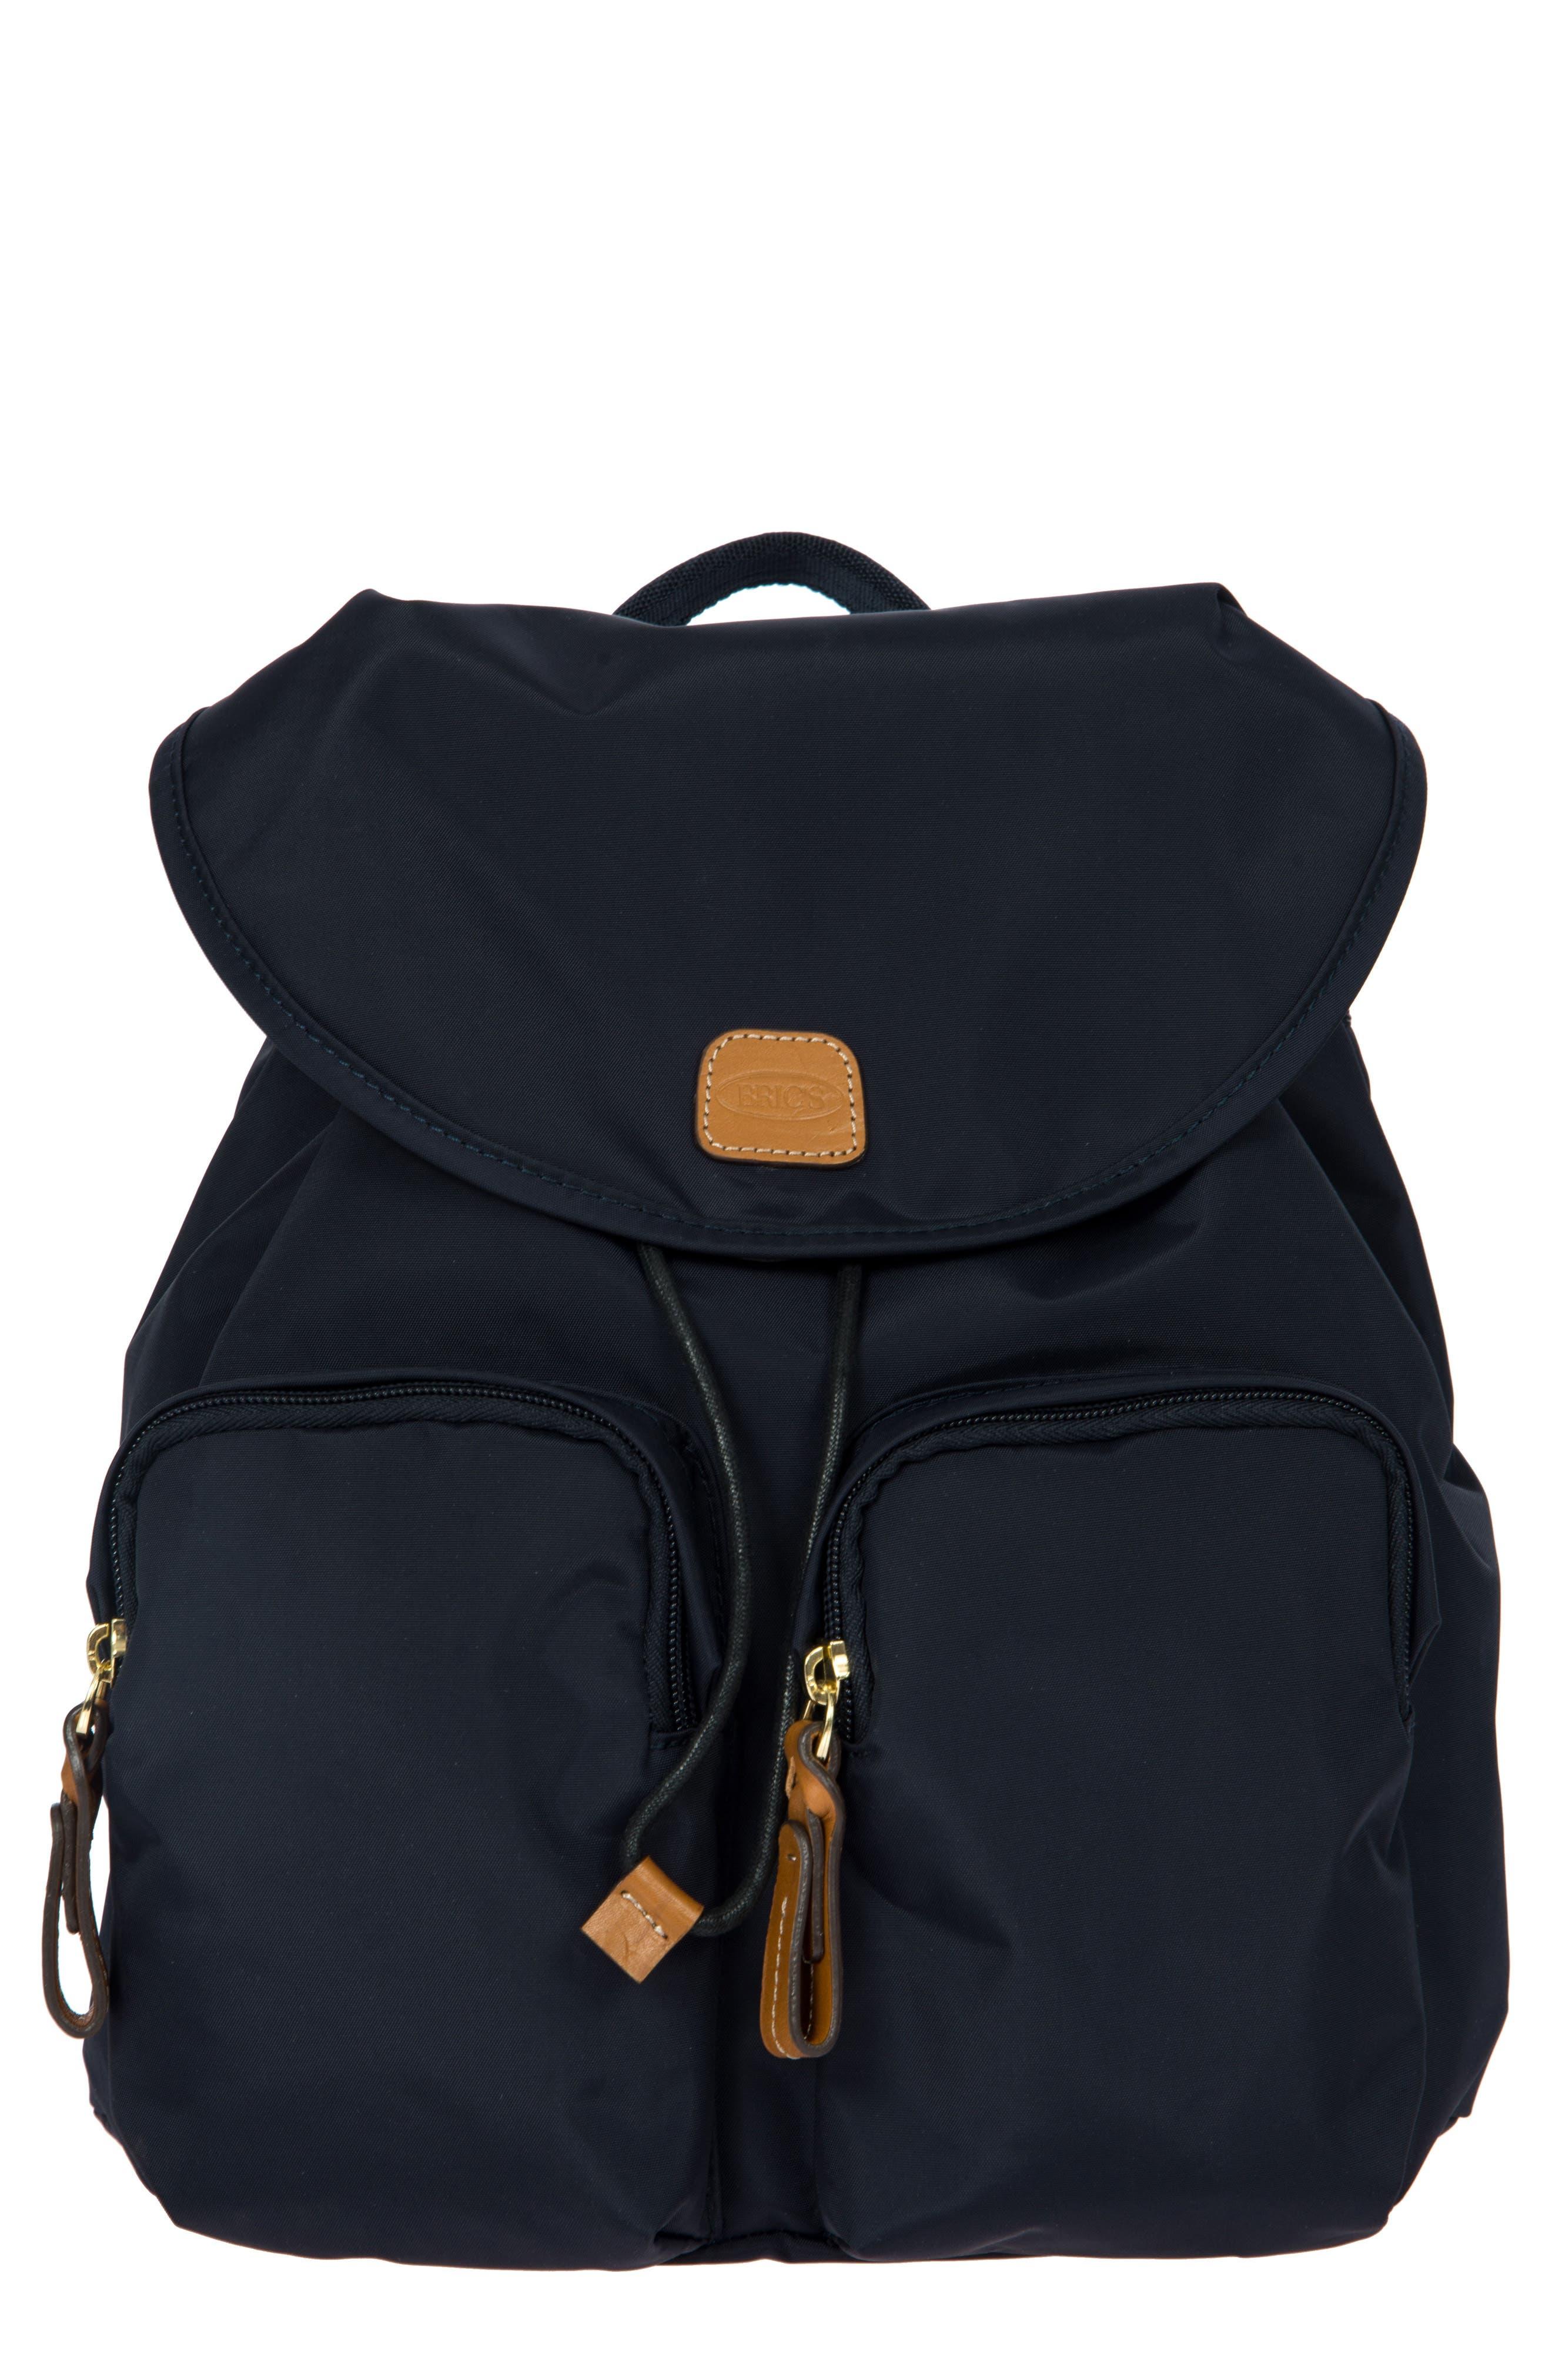 BRIC'S, X-Travel City Backpack, Main thumbnail 1, color, NAVY